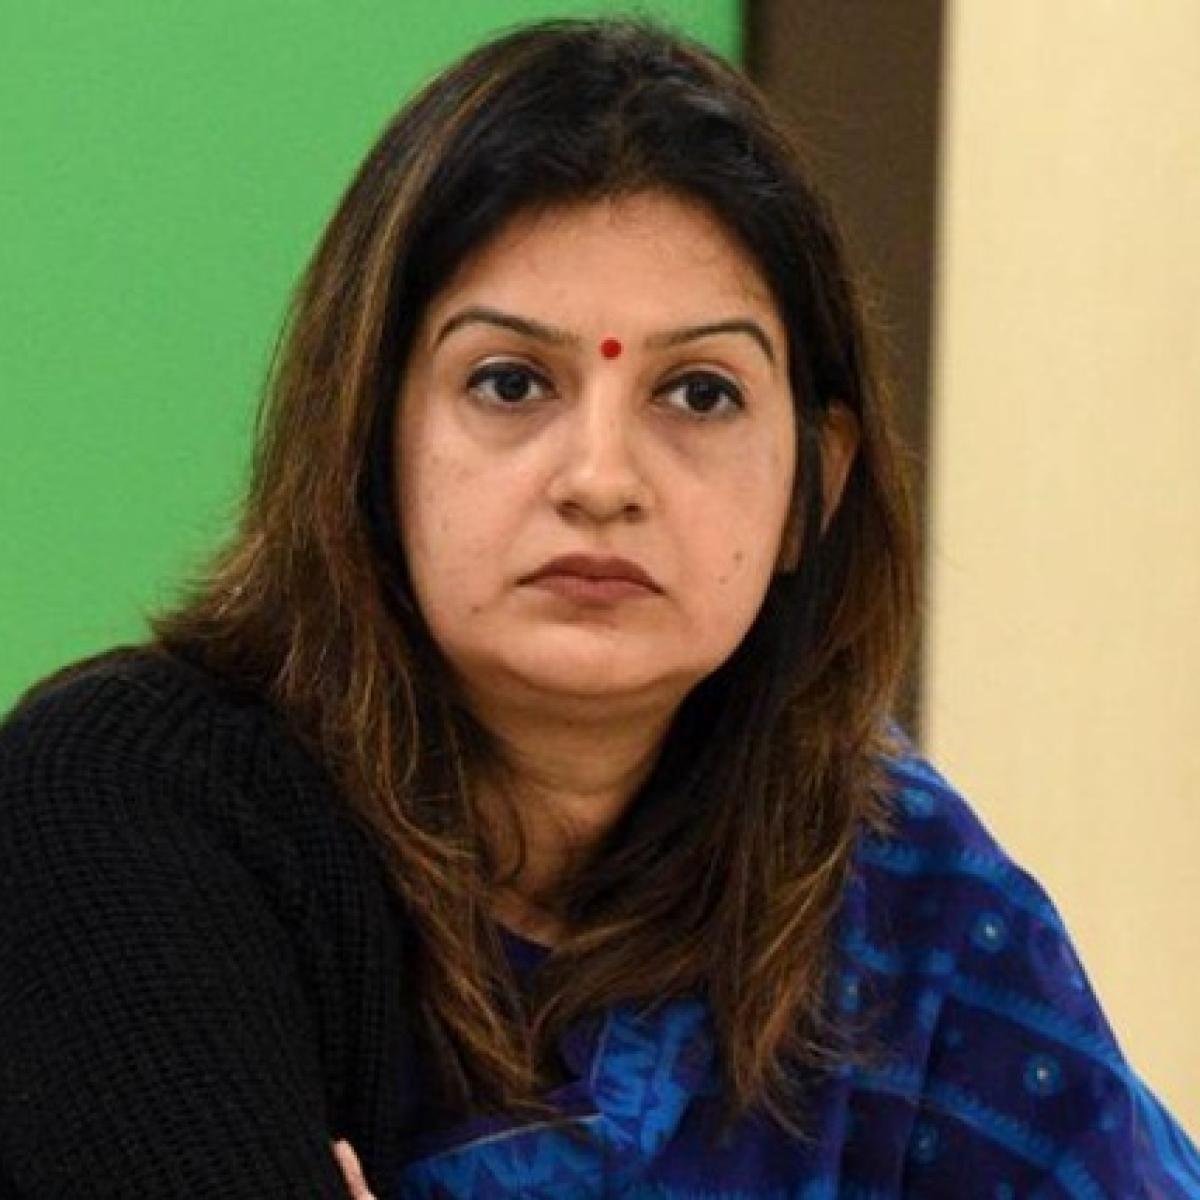 Glad to give you employment: Priyanka Chaturvedi hits back at Maha BJP trolls